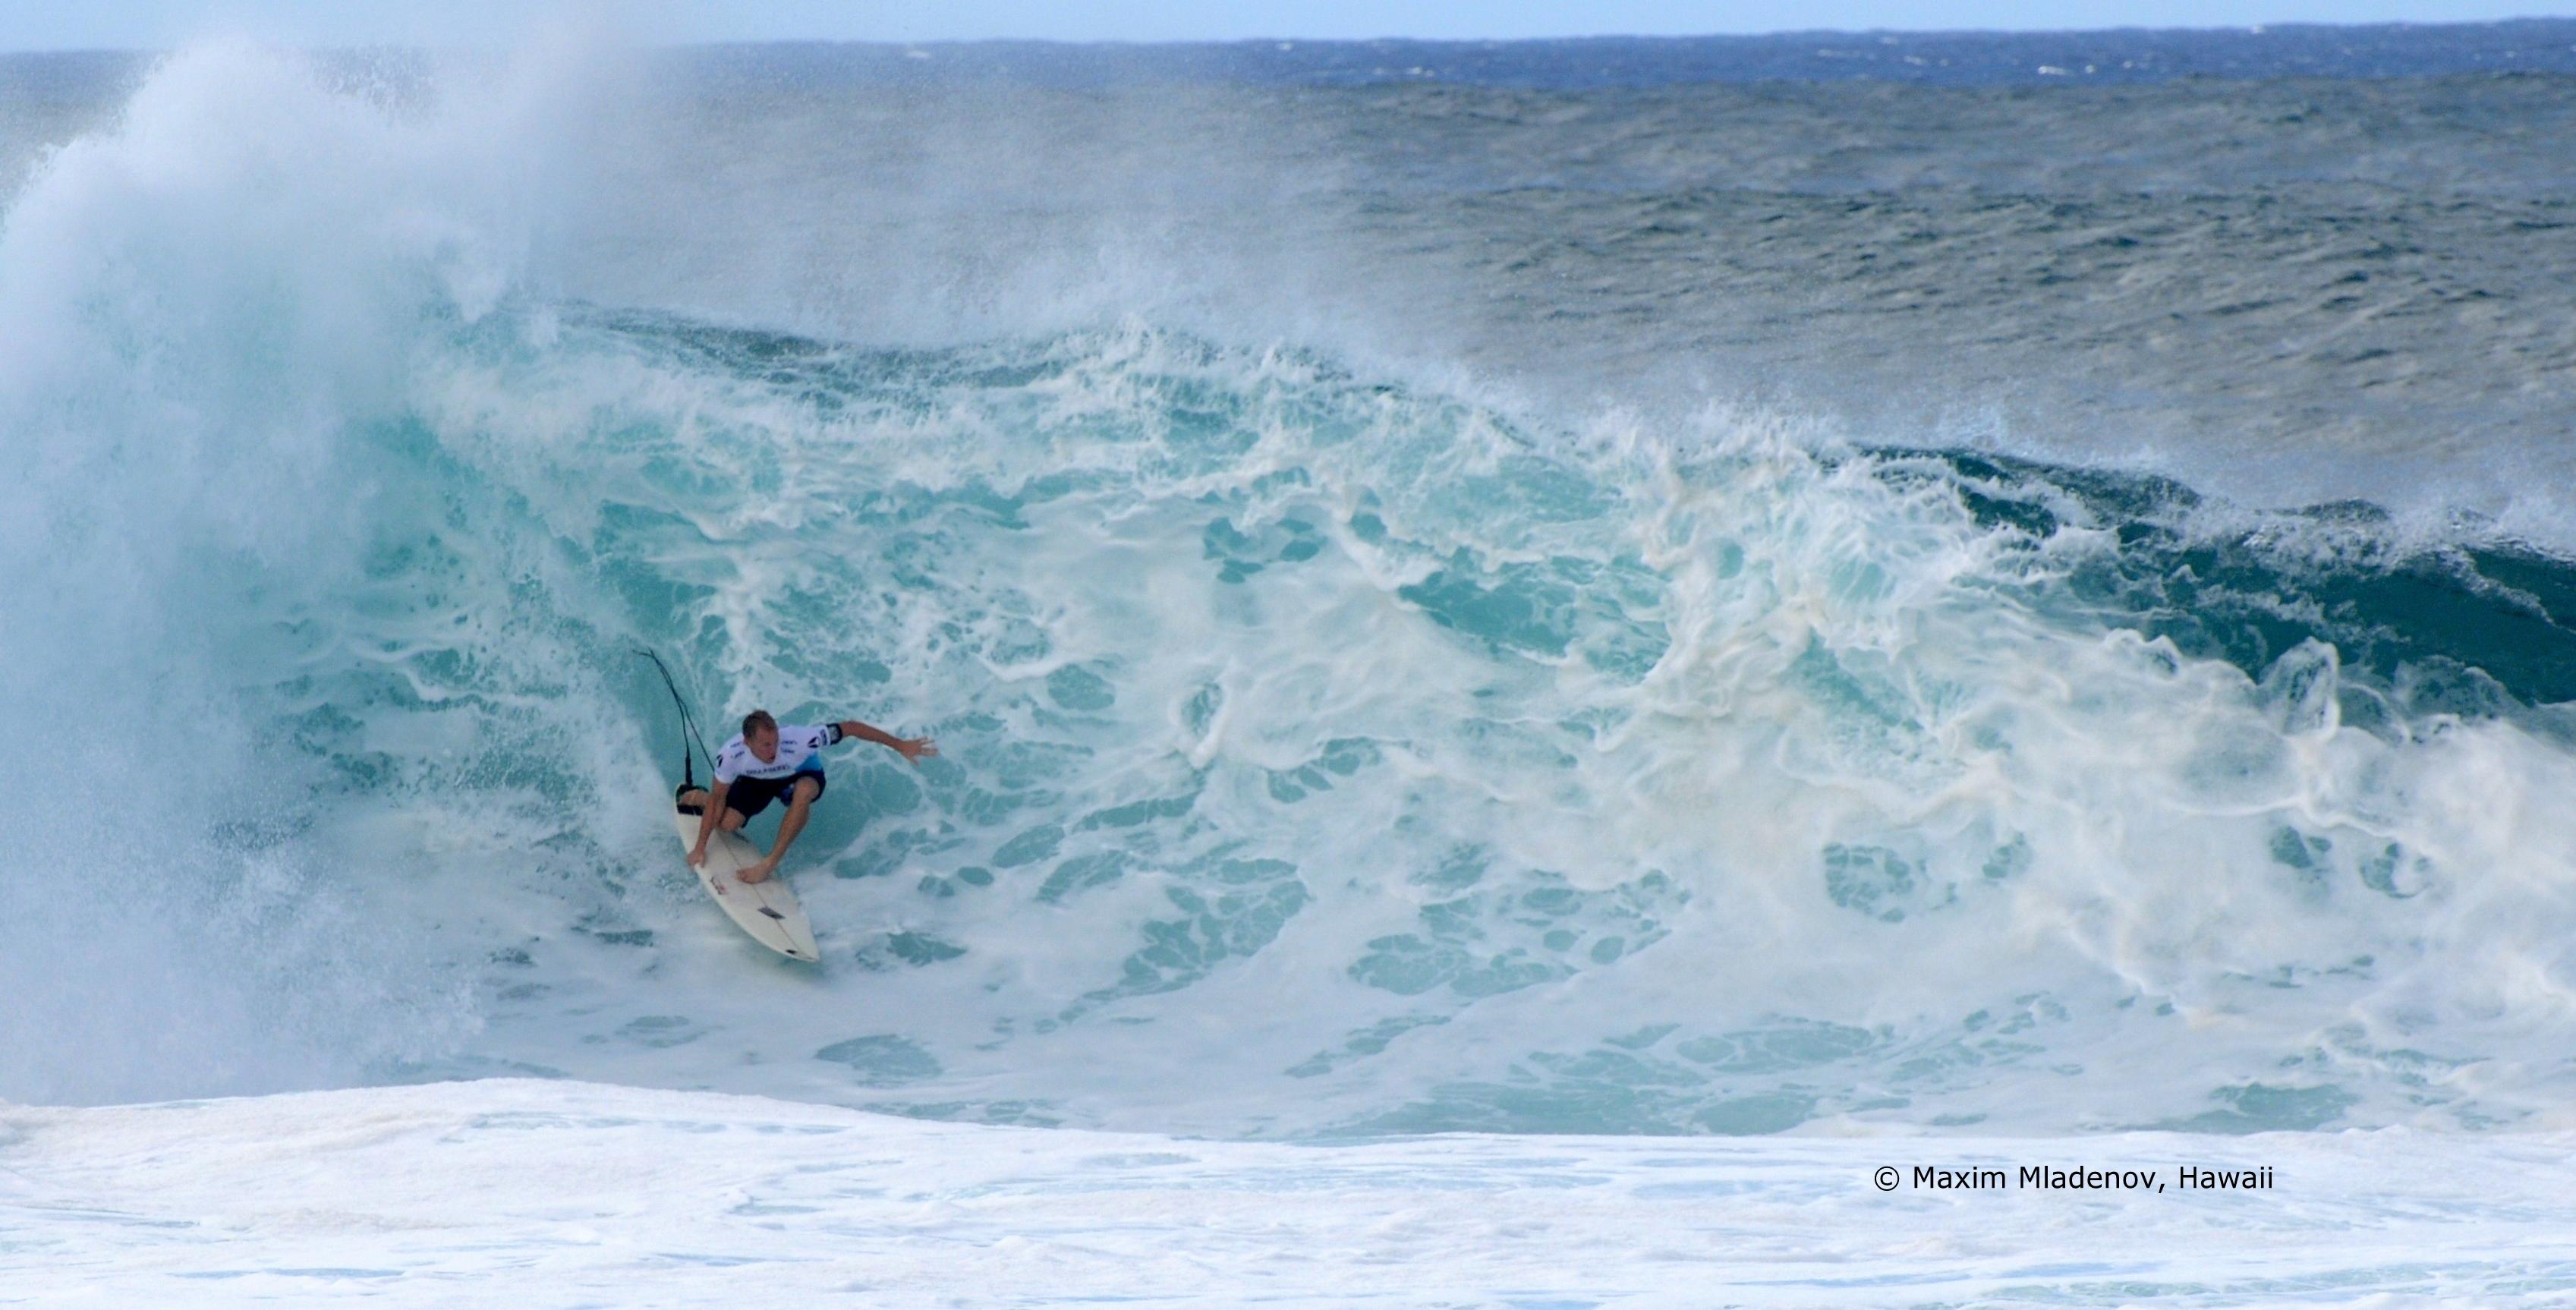 Gashhh - 1er Tour 08-12-2011 Billabong PIPE Masters © Maxim Mladenov - Hawaii